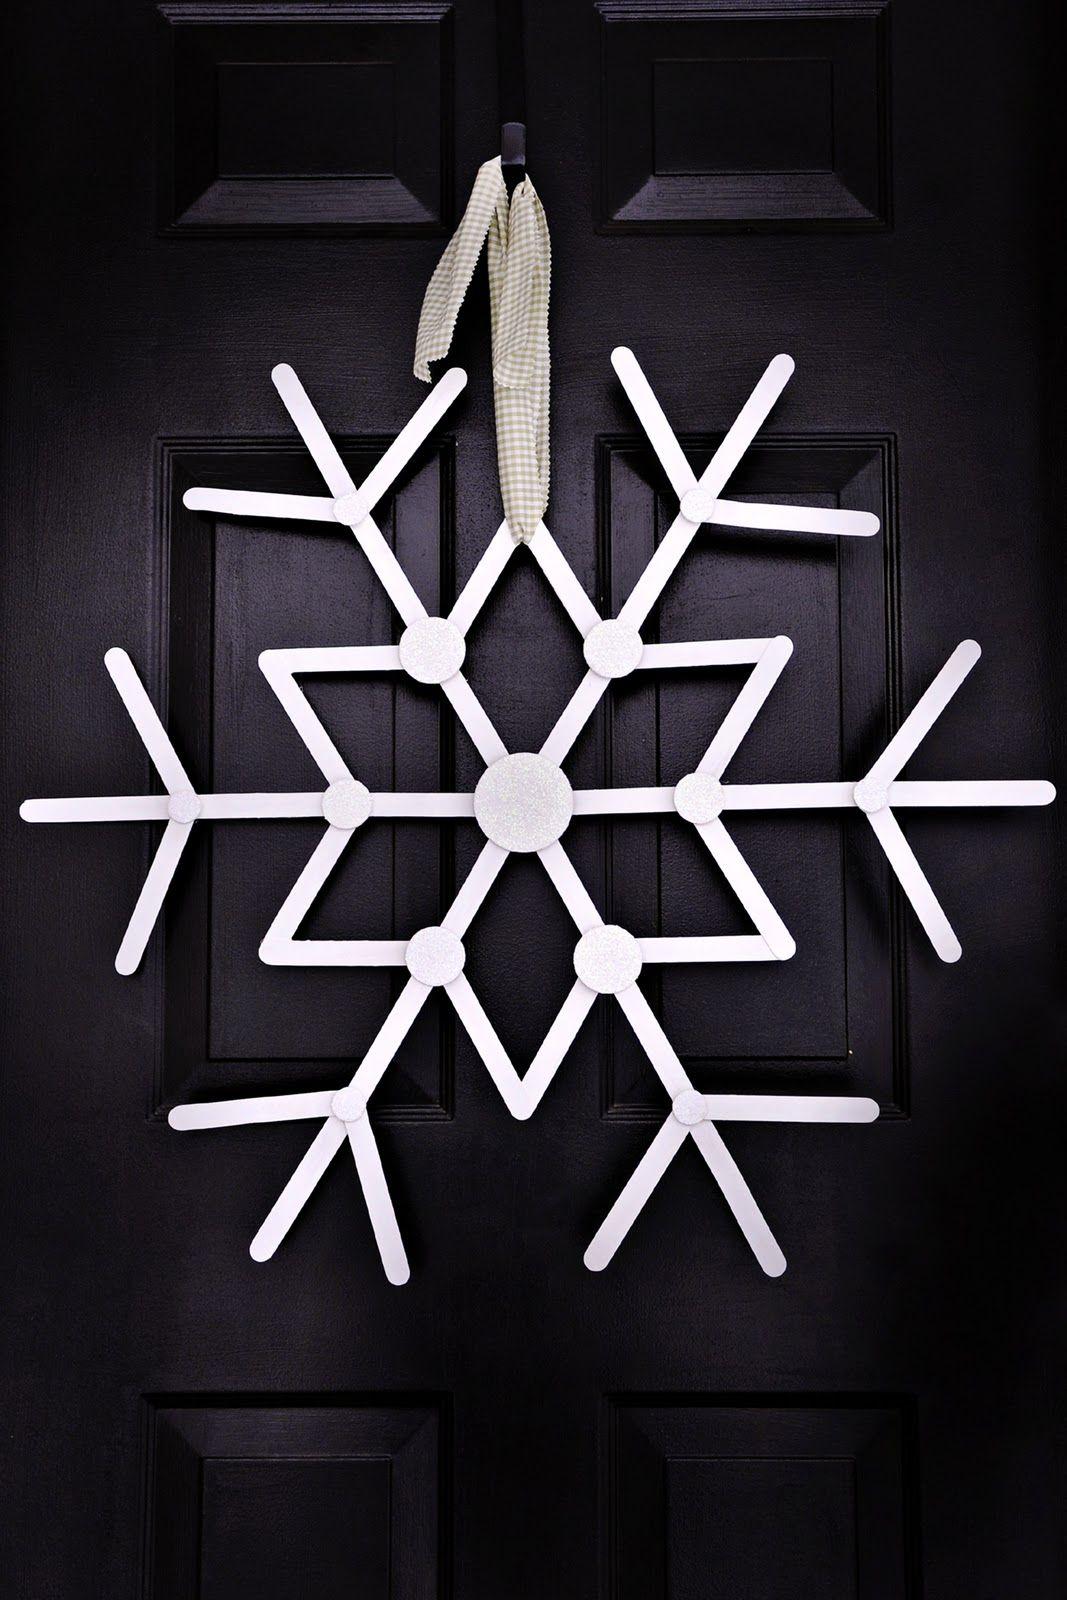 hanging craft stick snowflake f tes bricolage noel. Black Bedroom Furniture Sets. Home Design Ideas